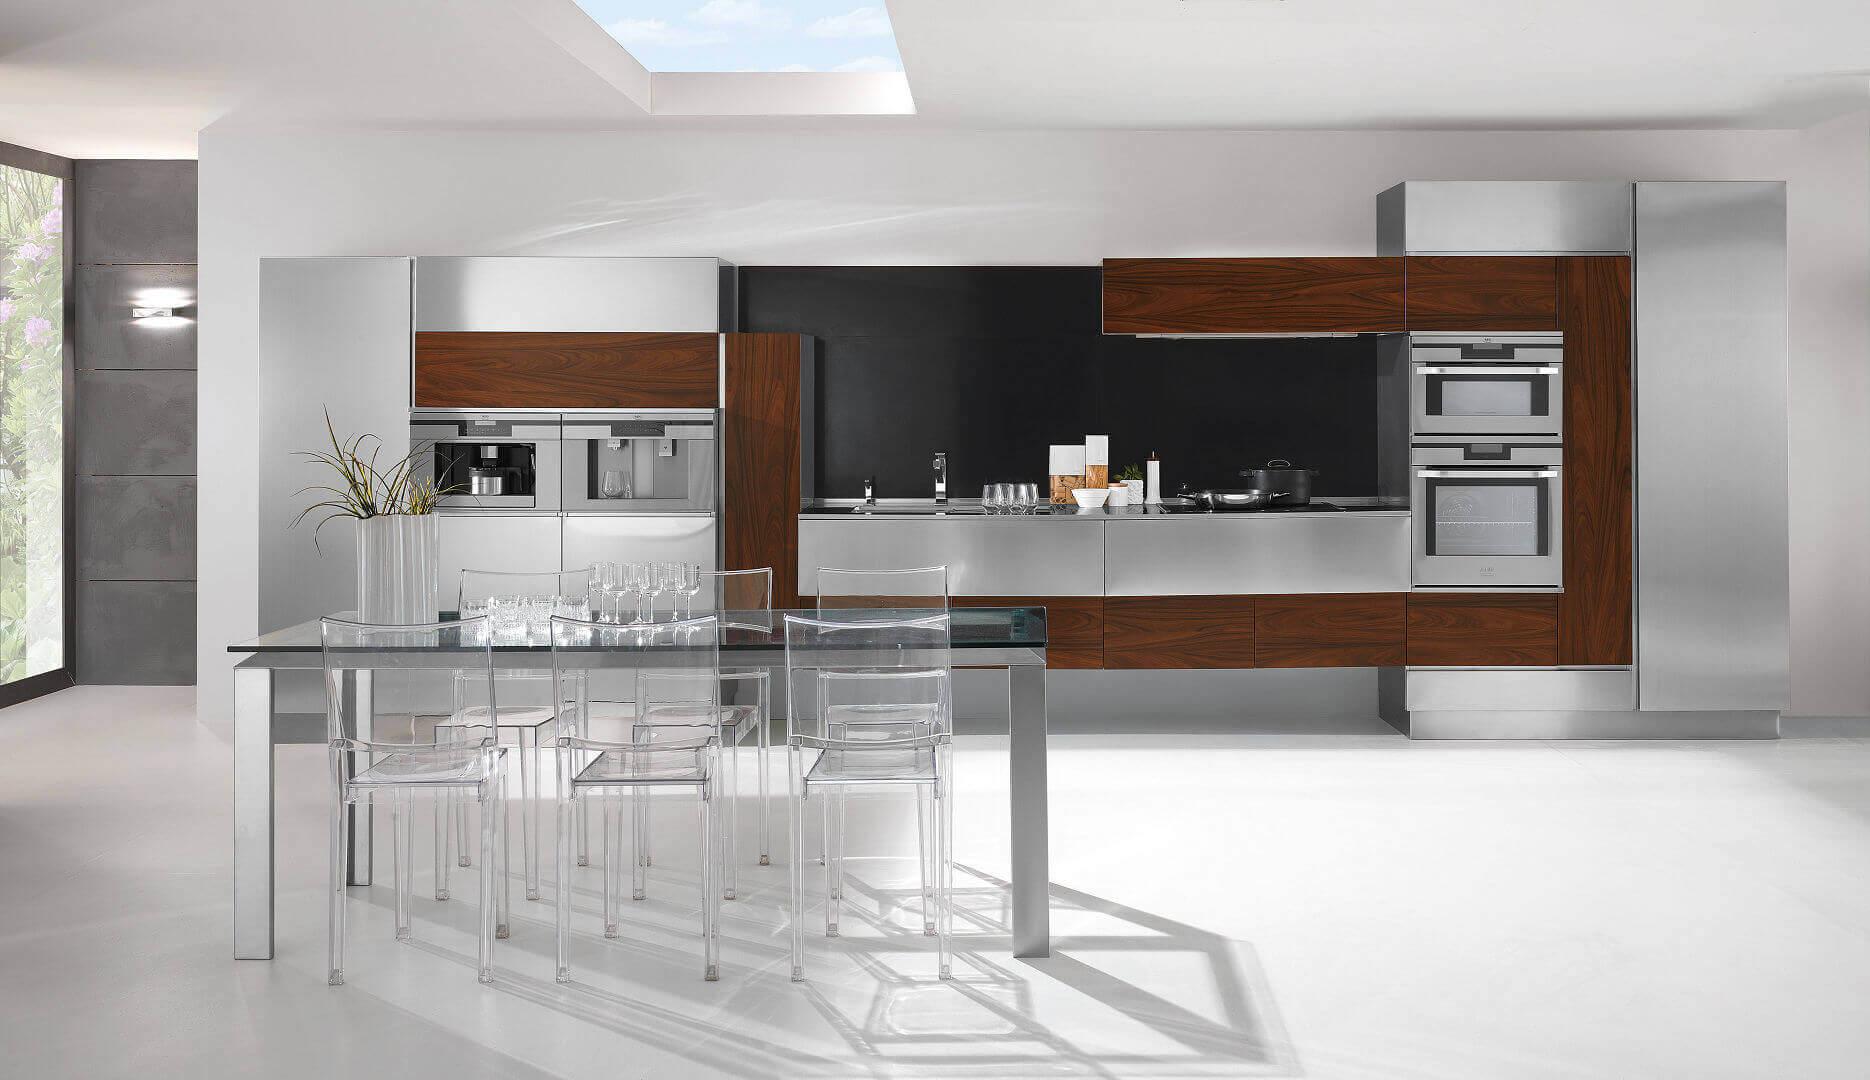 Mobili per cucina acciaio design casa creativa e mobili ispiratori - Cucine moderne colorate ...